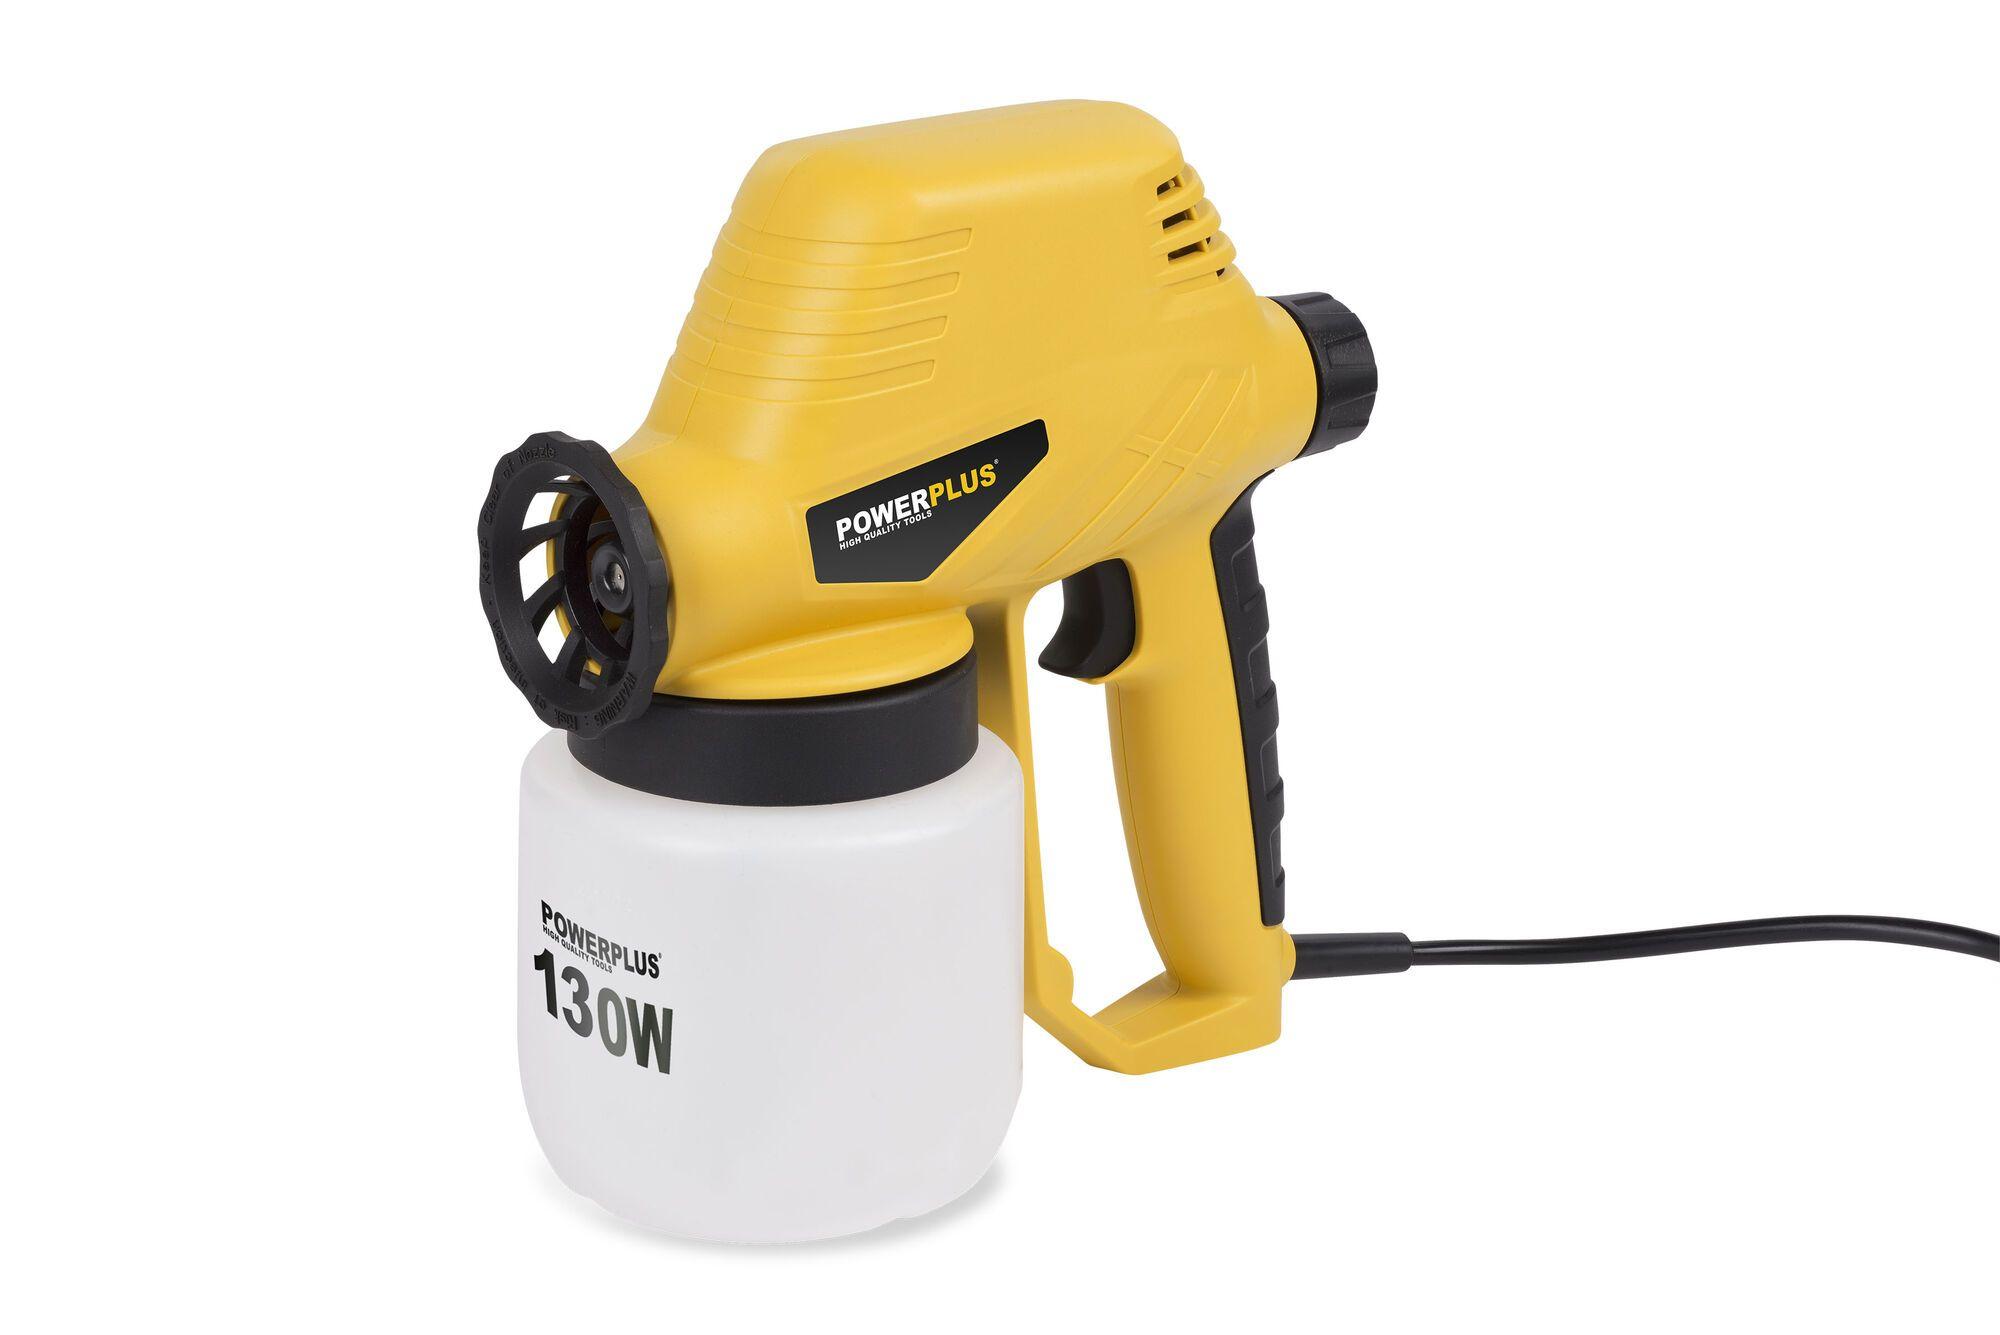 Powerplus POWX351 Elektrische verfspuit 130W | Verfpistool